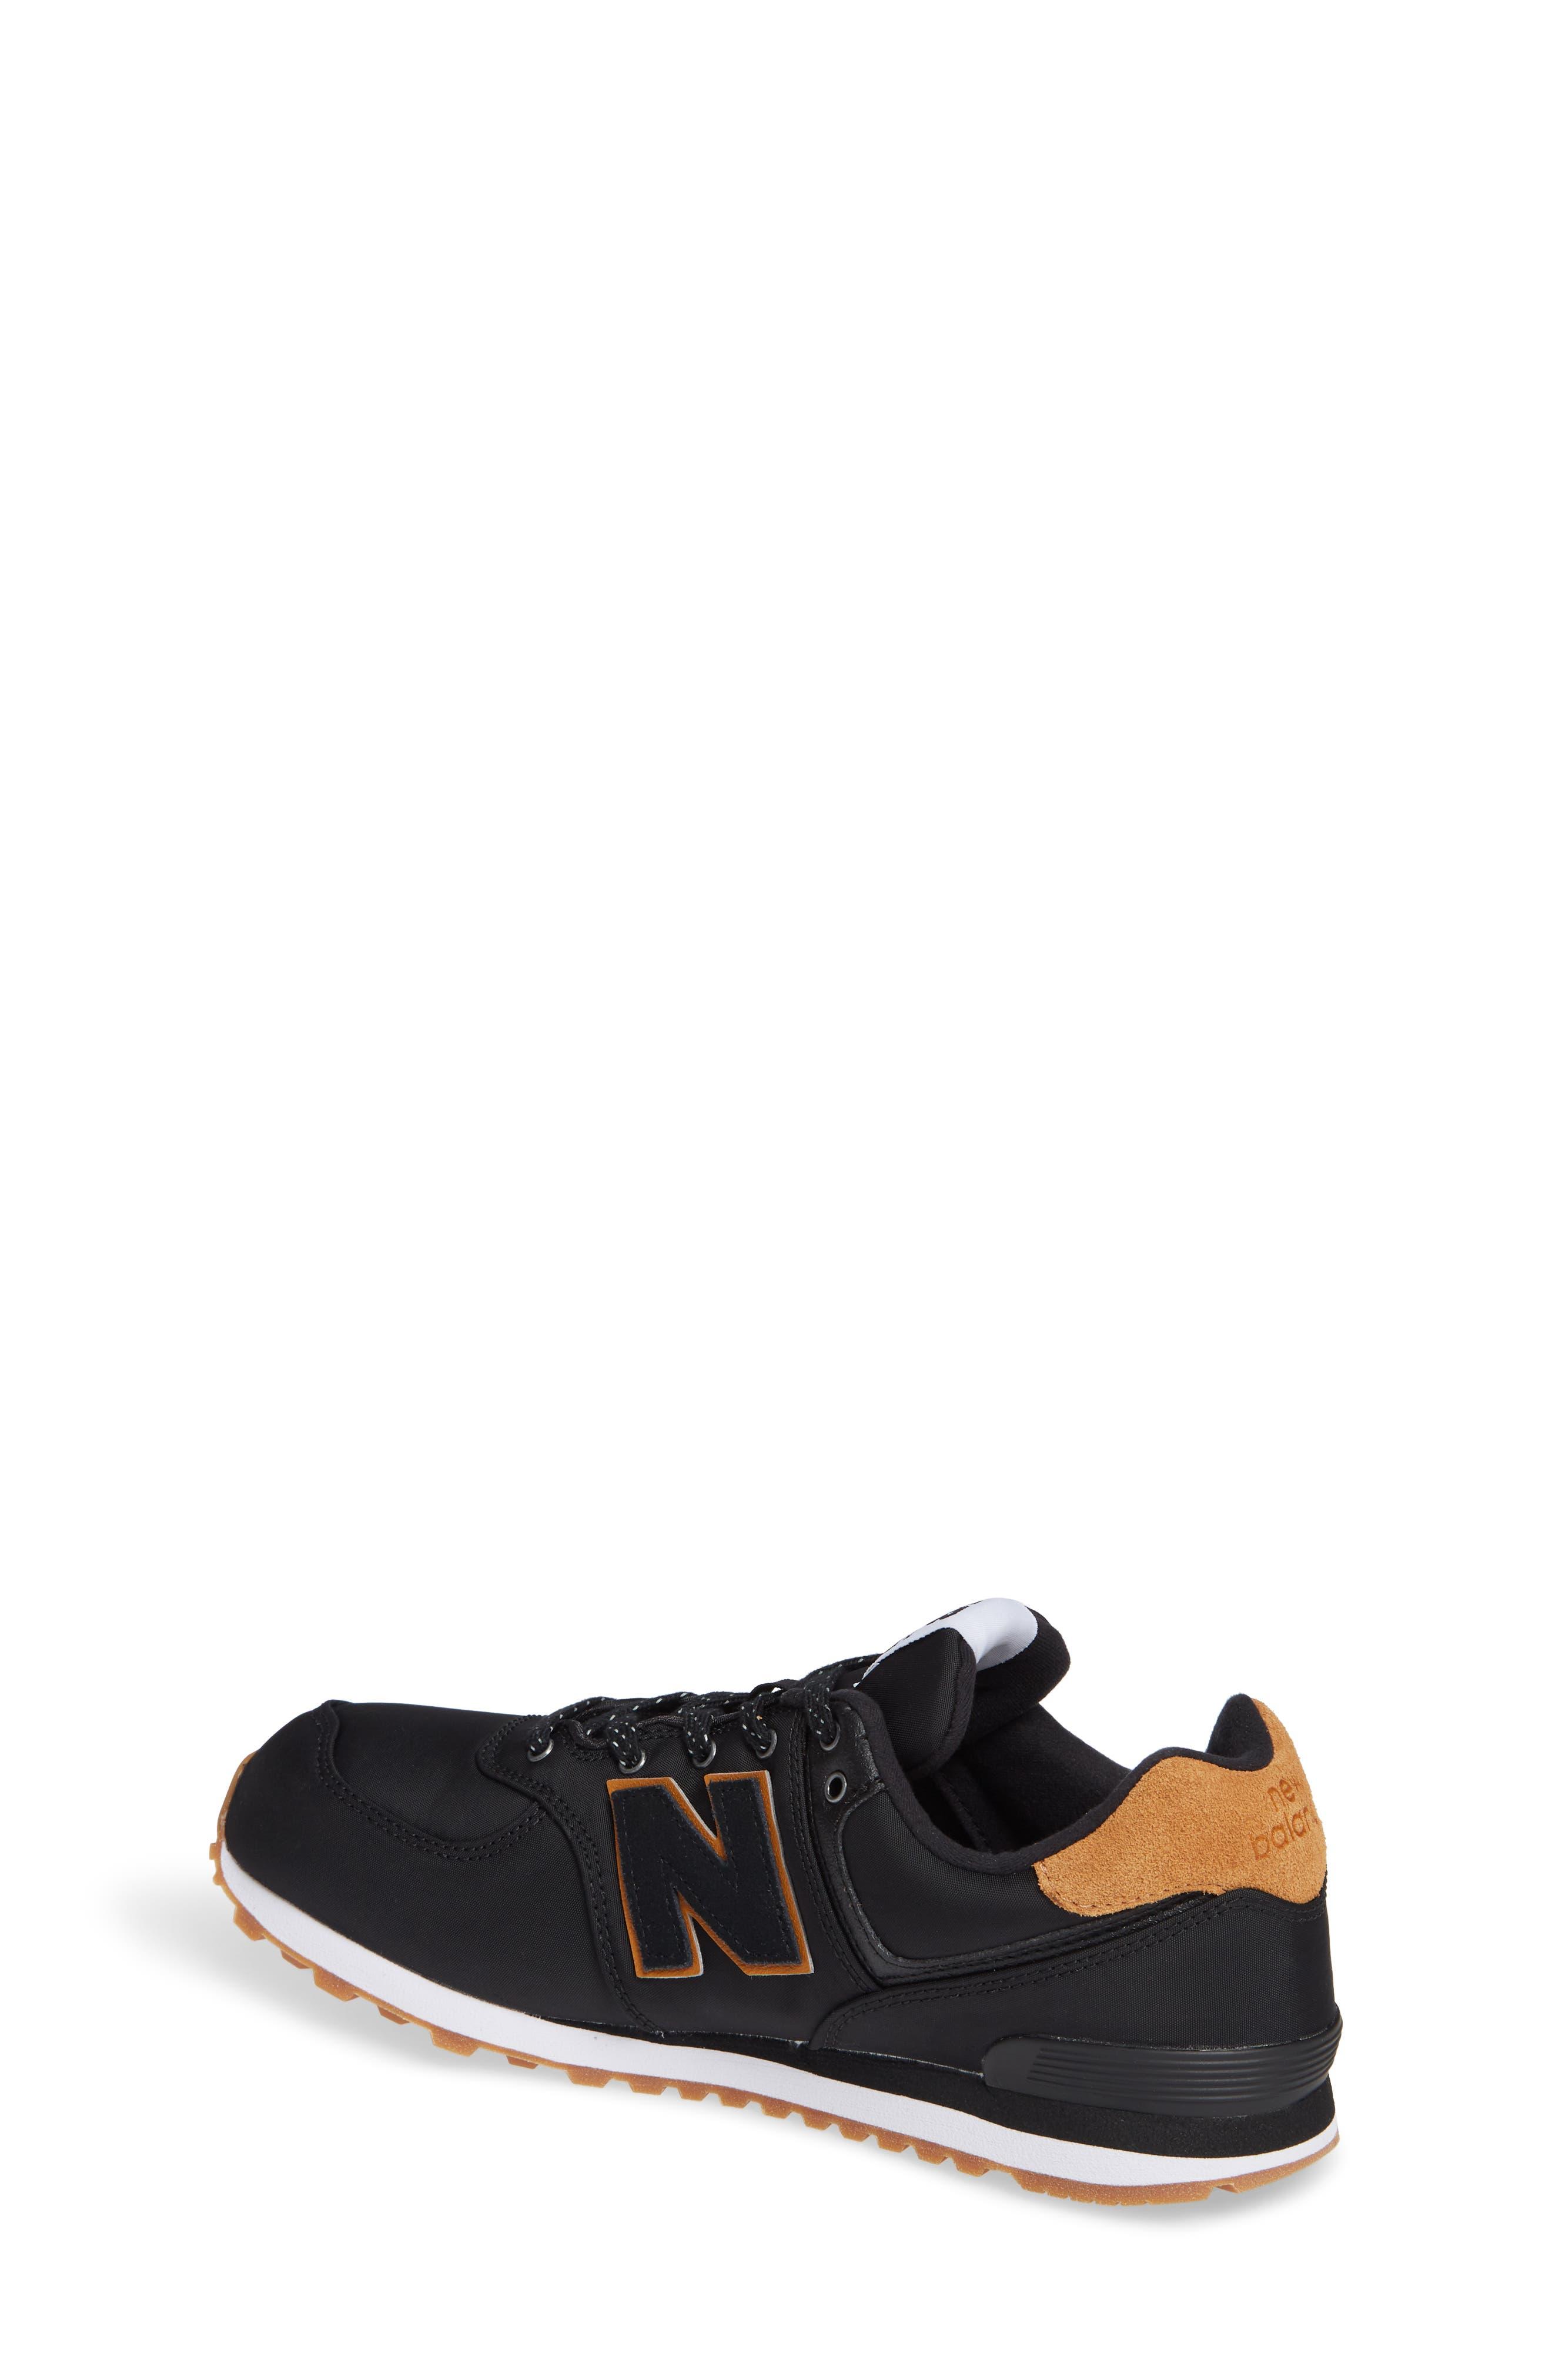 574 Essentials Sneaker,                             Alternate thumbnail 2, color,                             BLACK/ WHITE